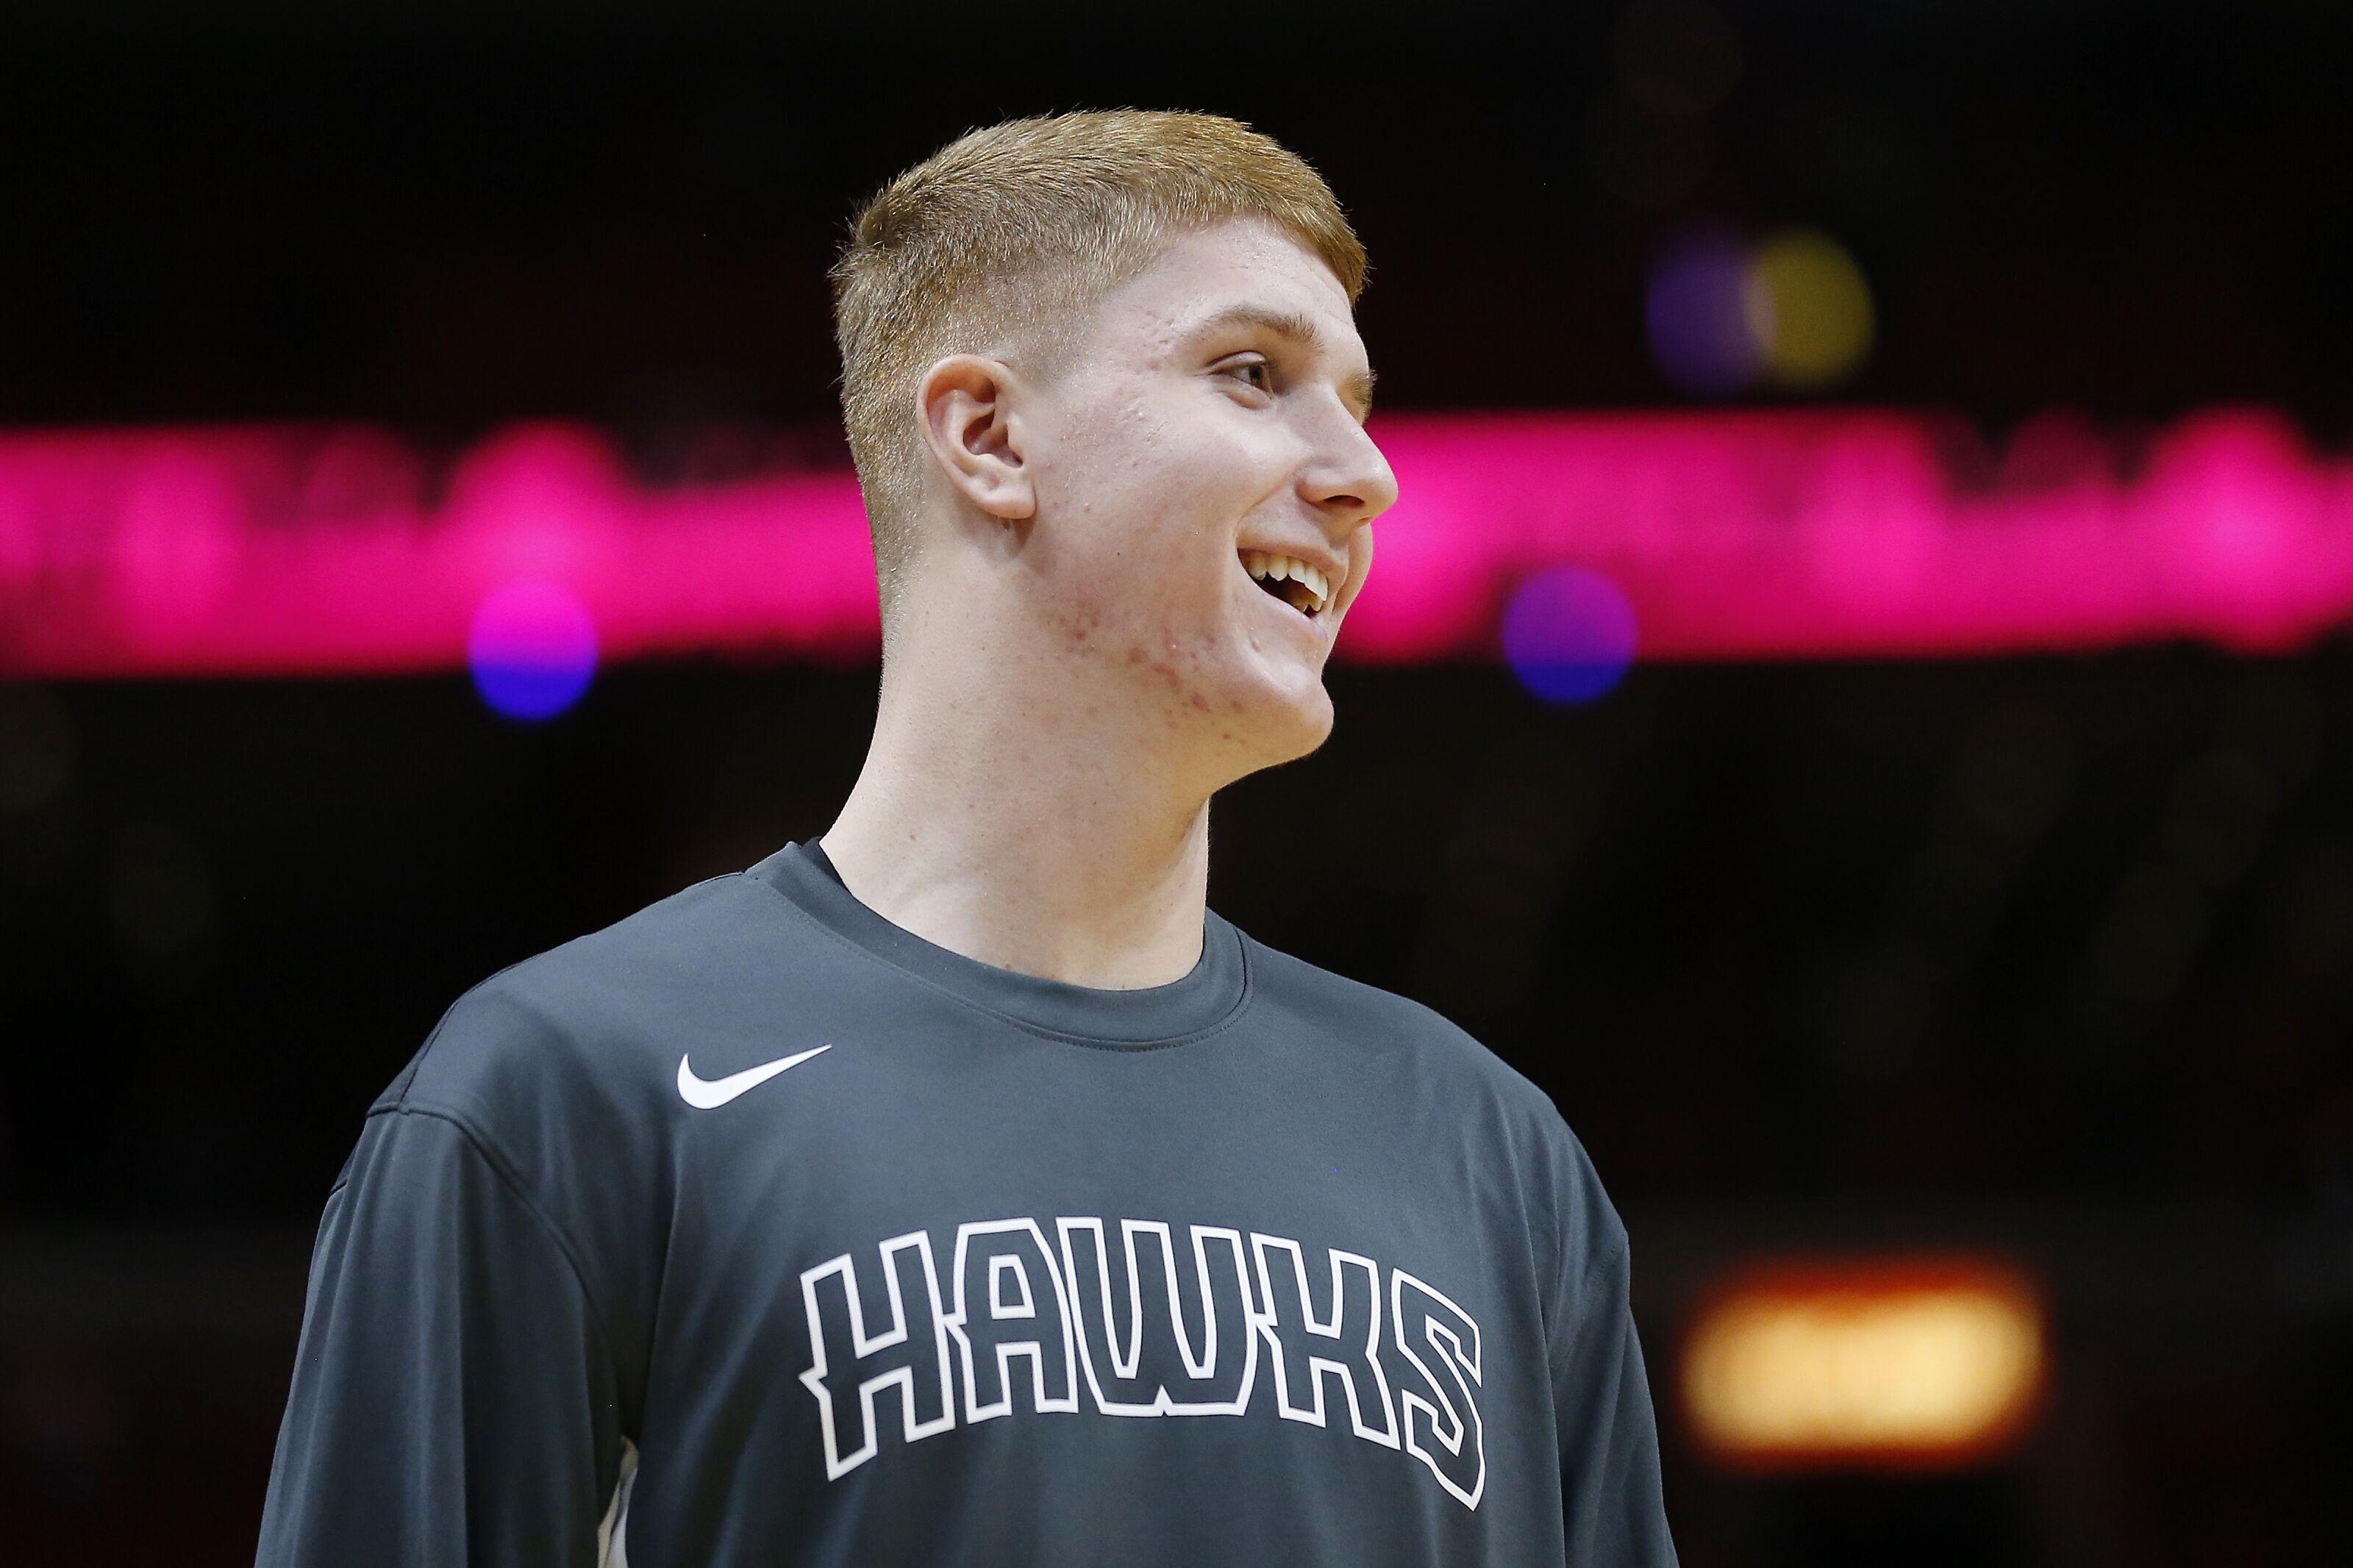 Atlanta Hawks: When Will Kevin Huerter Return to Action?